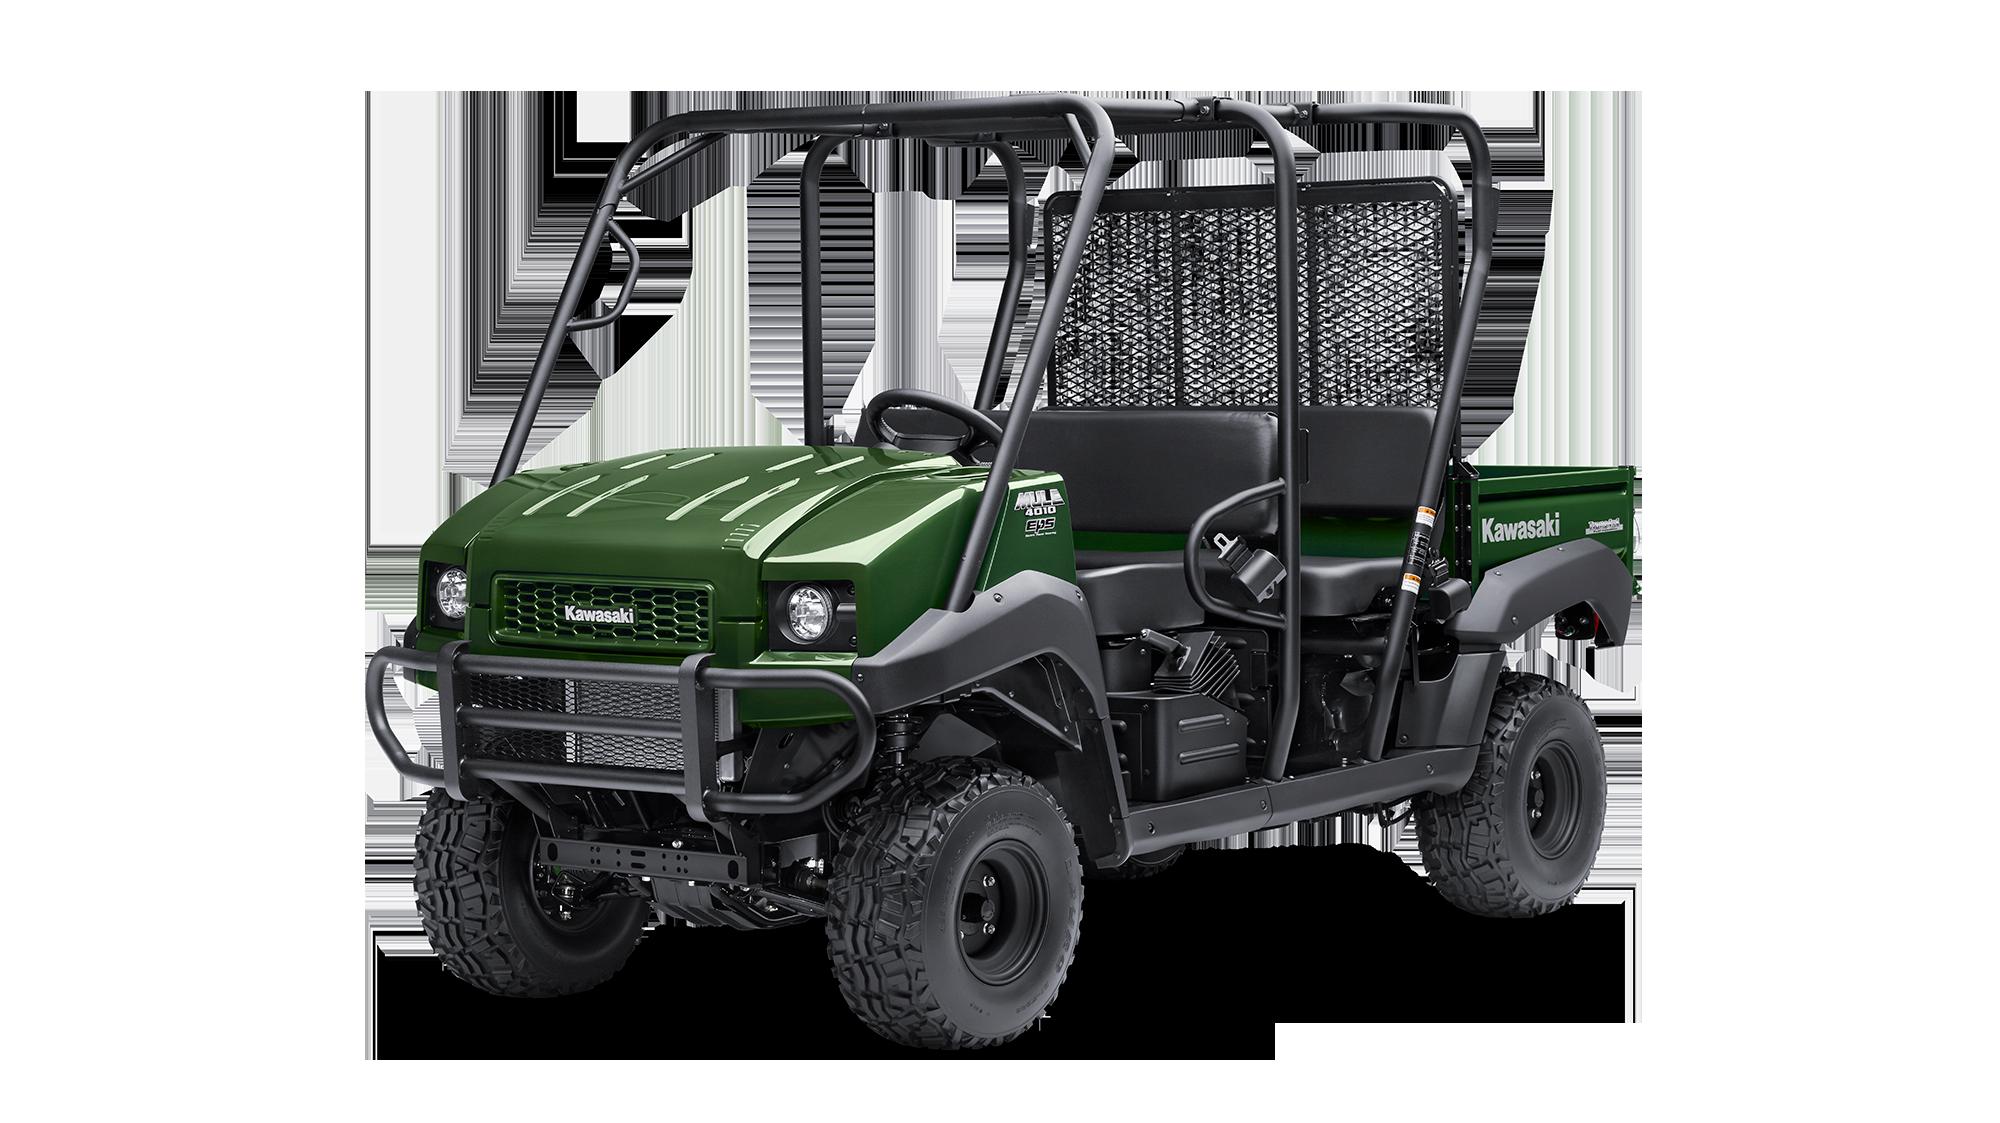 Fine 2019 Mule 4010 Trans4X4 Mule Side X Side By Kawasaki Wiring Cloud Mousmenurrecoveryedborg